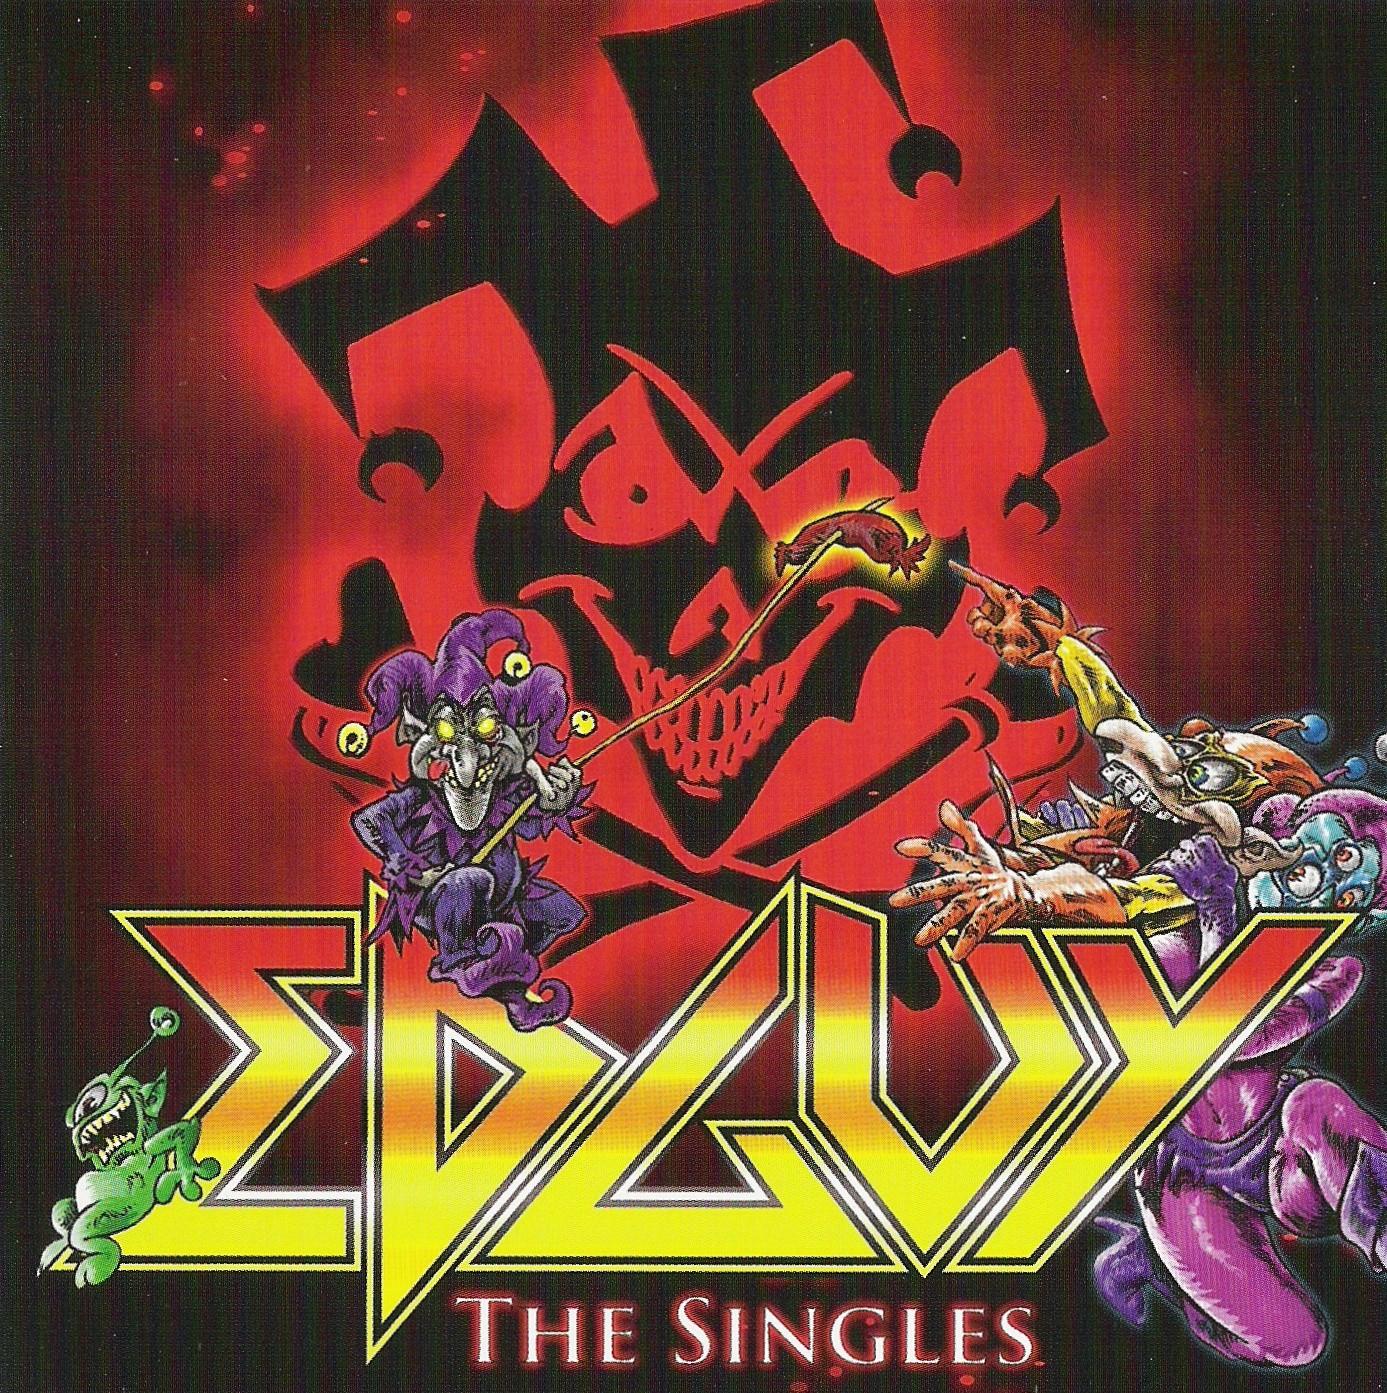 http://4.bp.blogspot.com/_wdDVA97bI_E/TGg7LazjYhI/AAAAAAAAAkI/o0Ro618v-yA/s1600/edguy_the_singles_2008_retail_cd-front.jpg